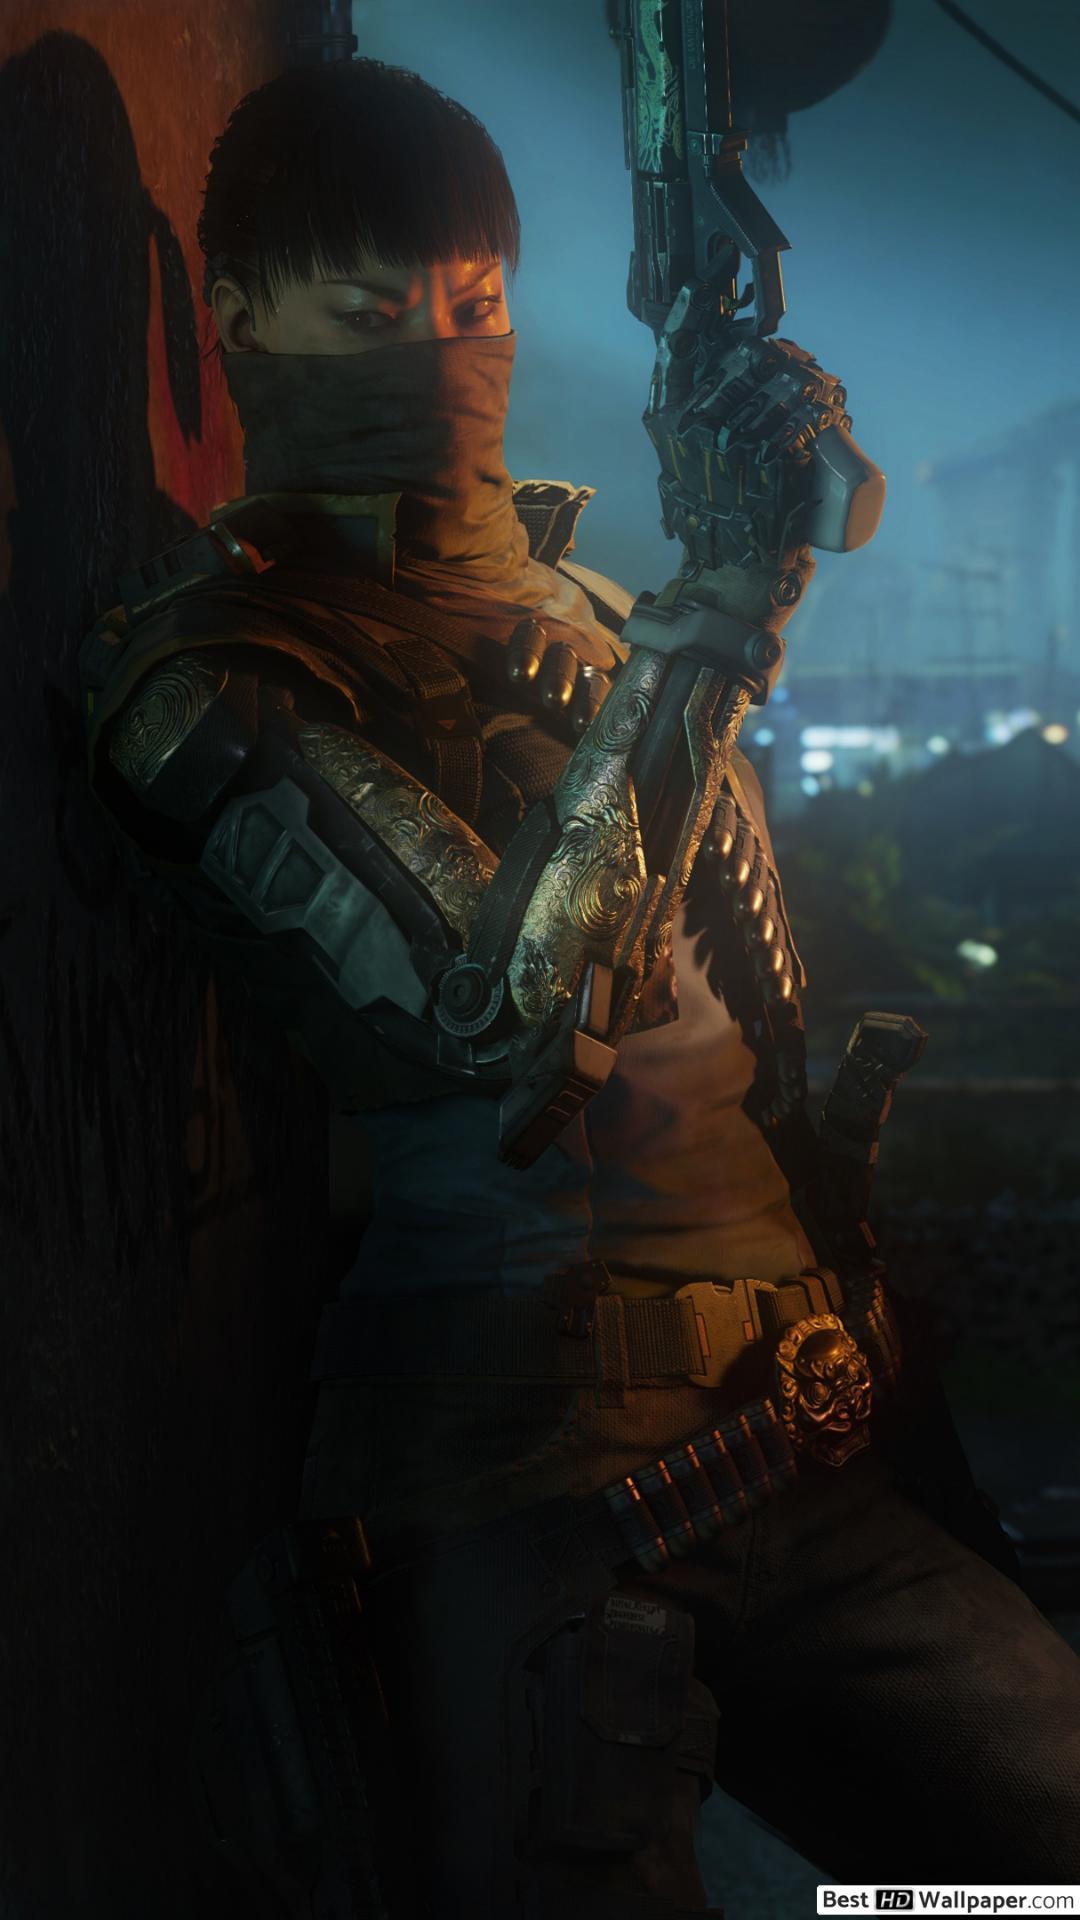 Call Of Duty Black Ops 3 Seraph - HD Wallpaper